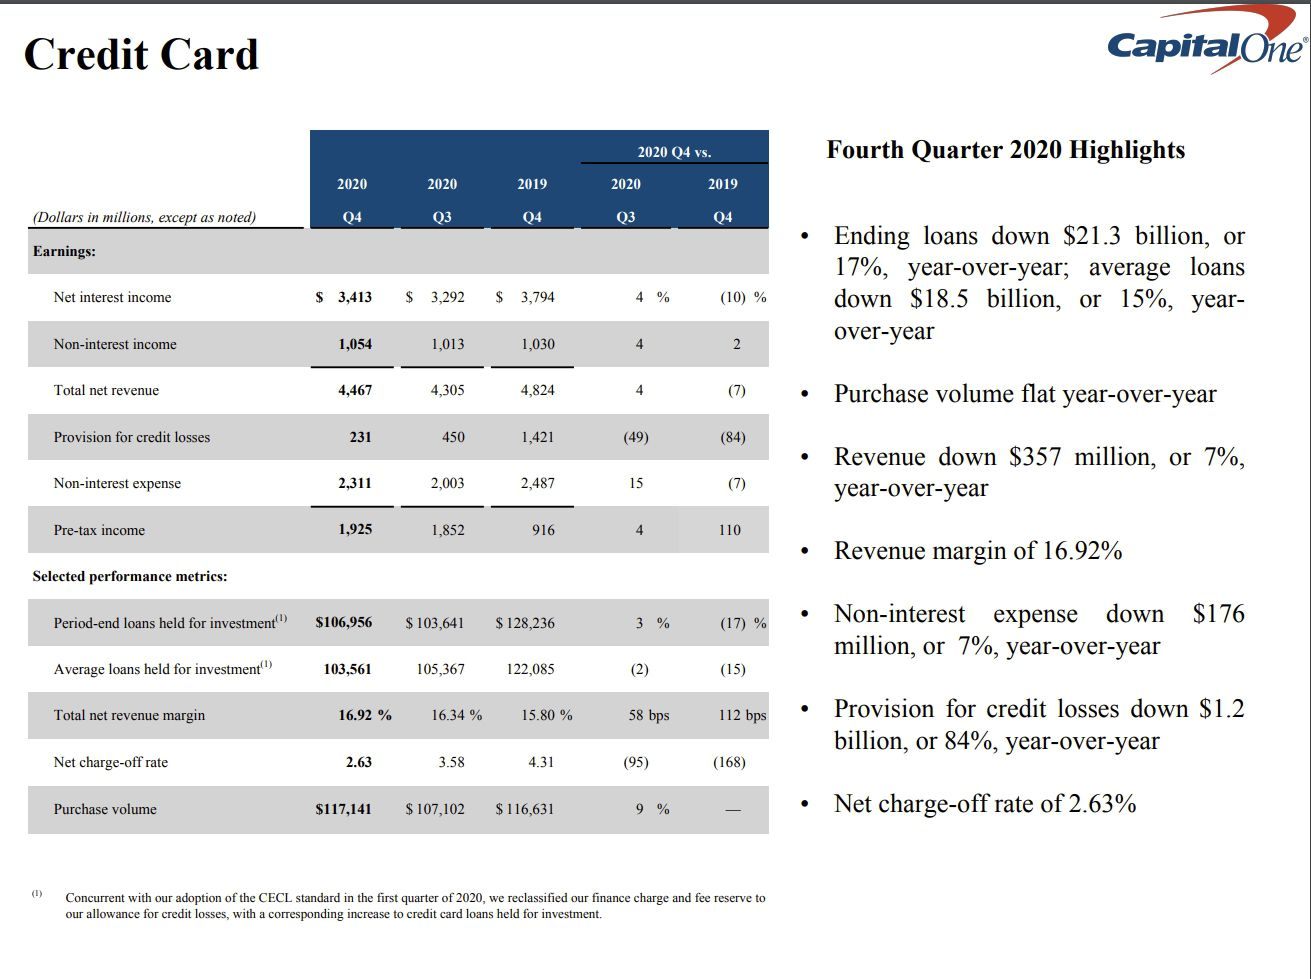 Capital One Q4 2020 Highlights